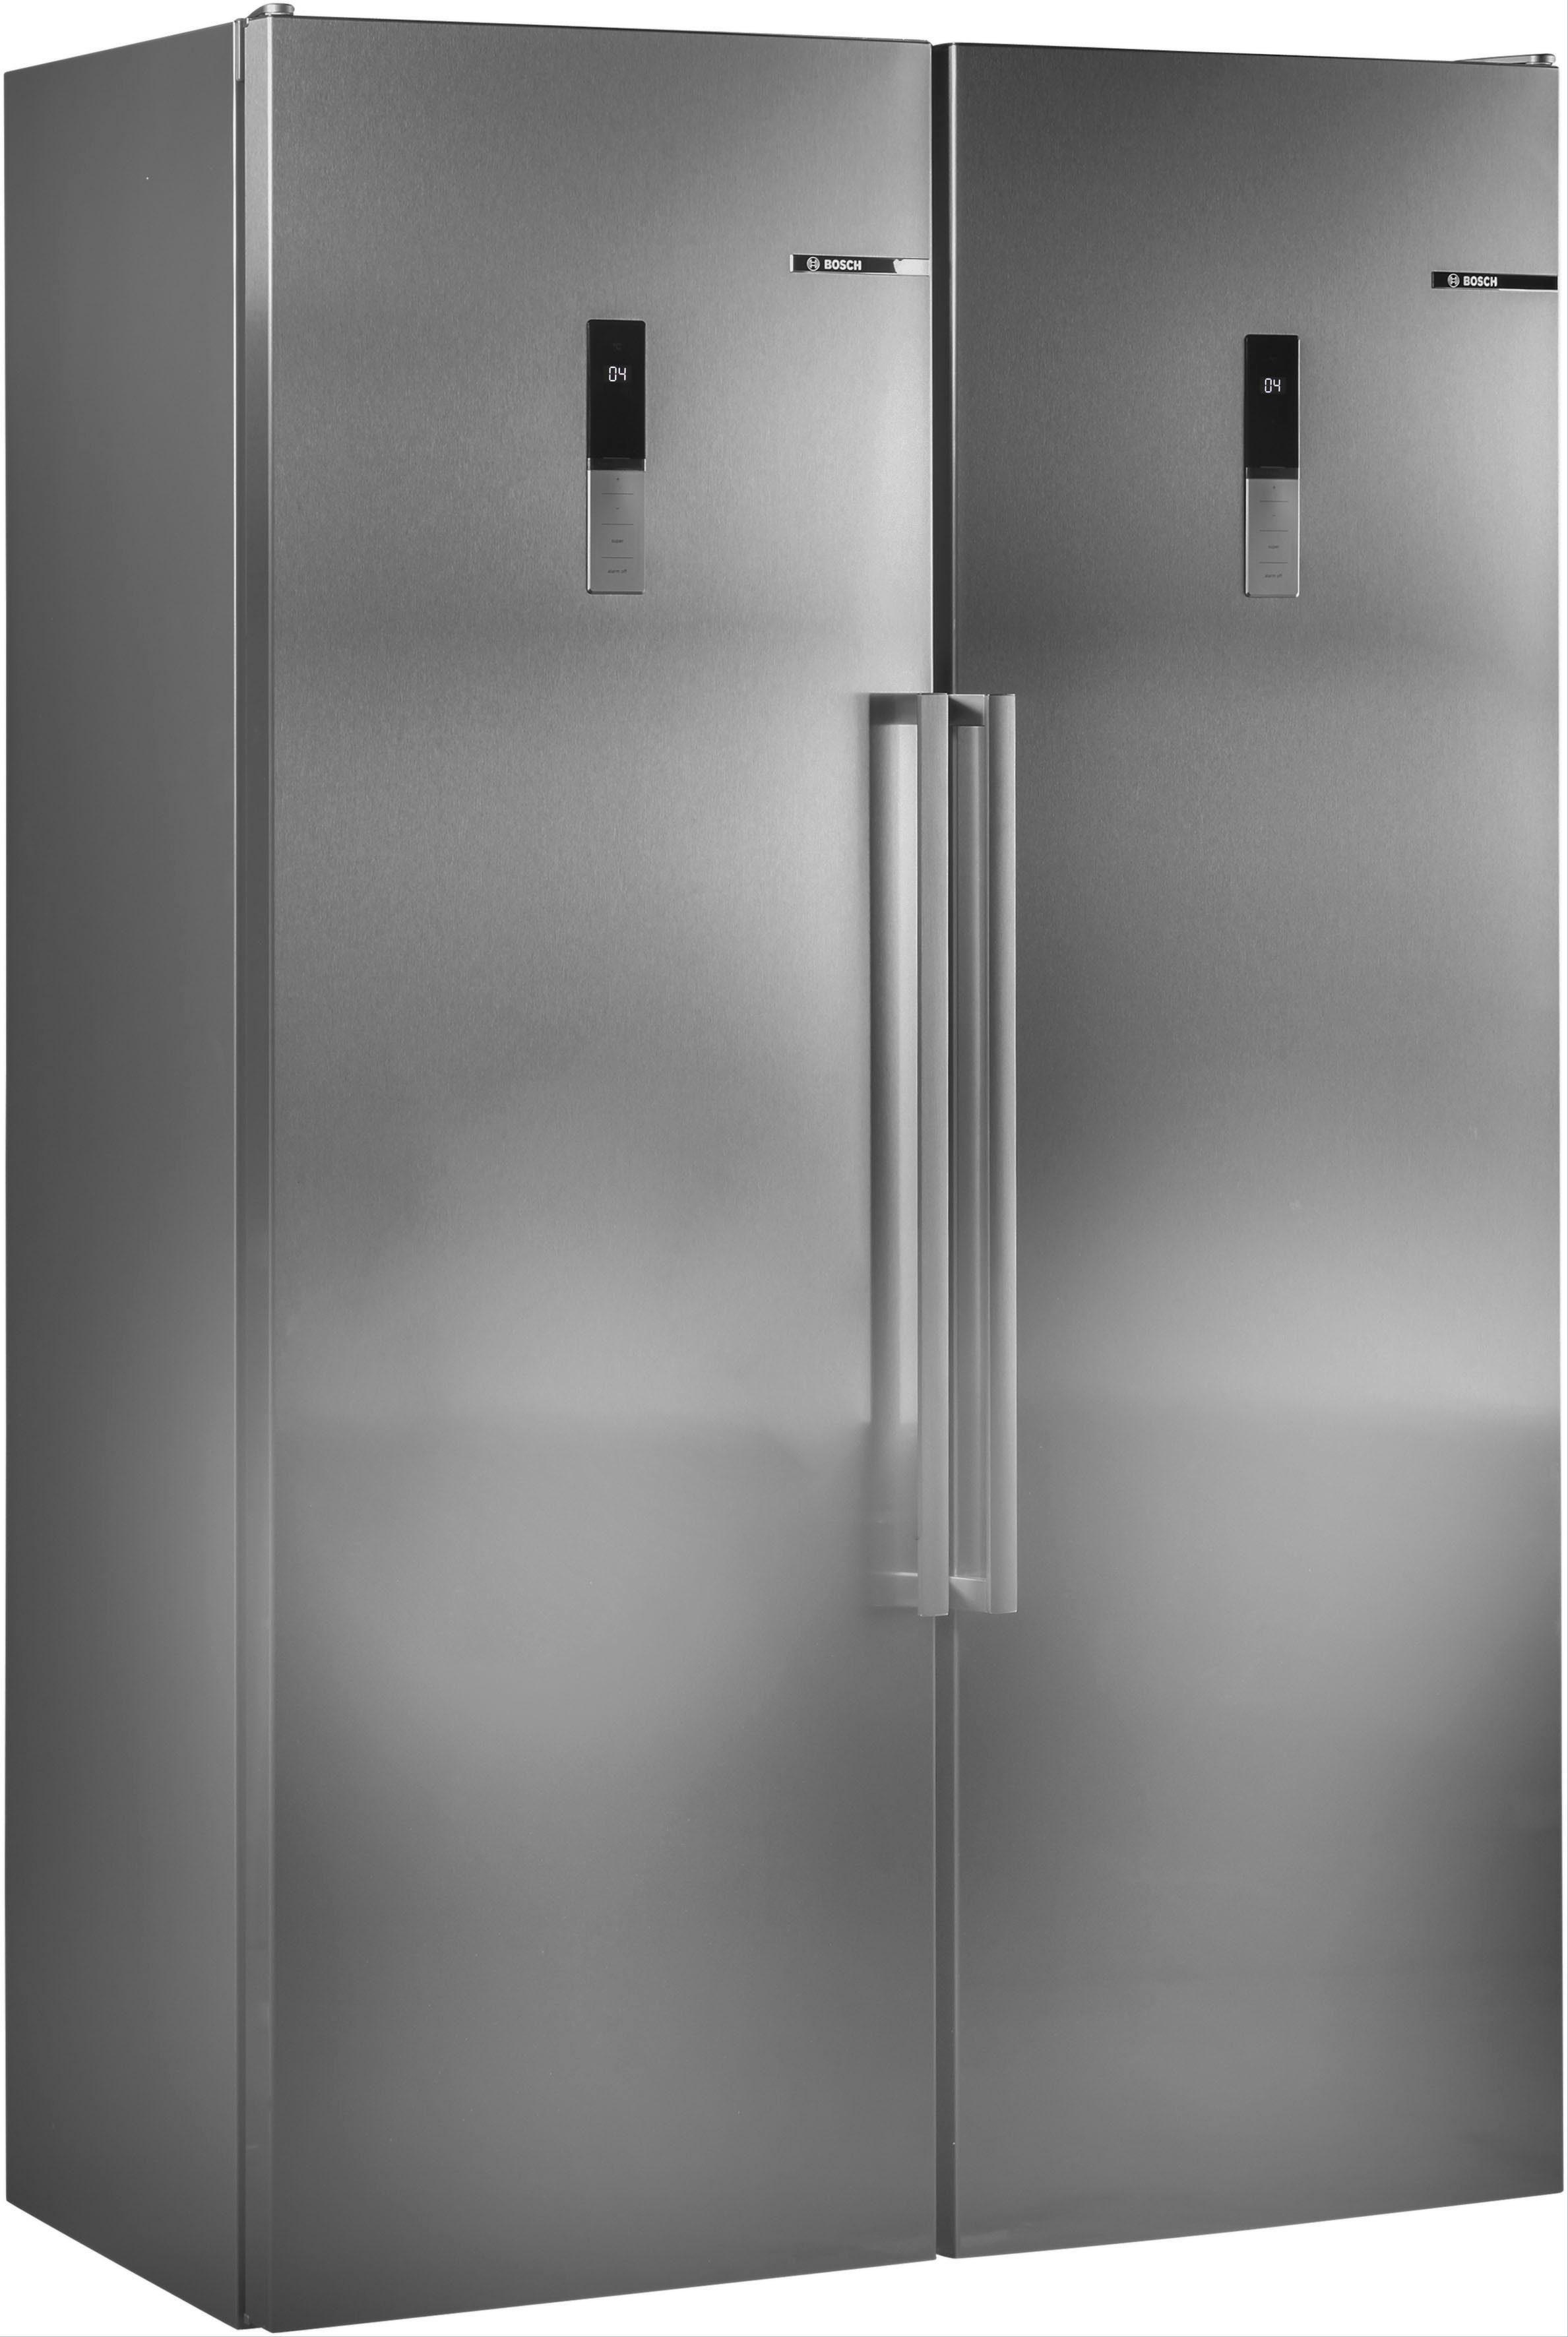 BOSCH Side-by-Side Serie 6 KAN95BI3P, 187 cm hoch, 120 cm breit